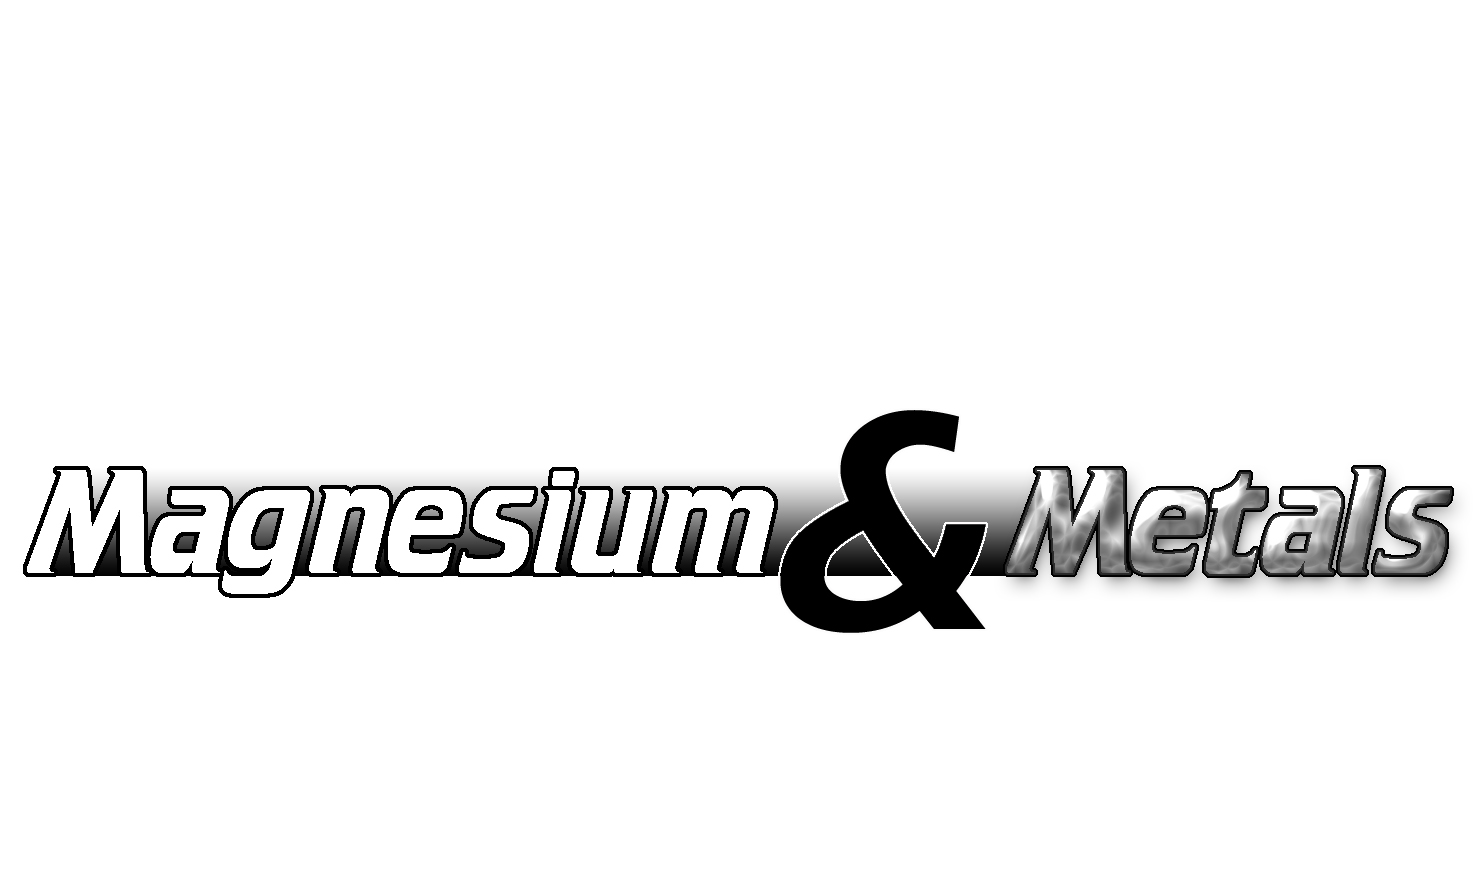 Логотип для проекта Magnesium&Metals фото f_4e7e440dc89d5.jpg